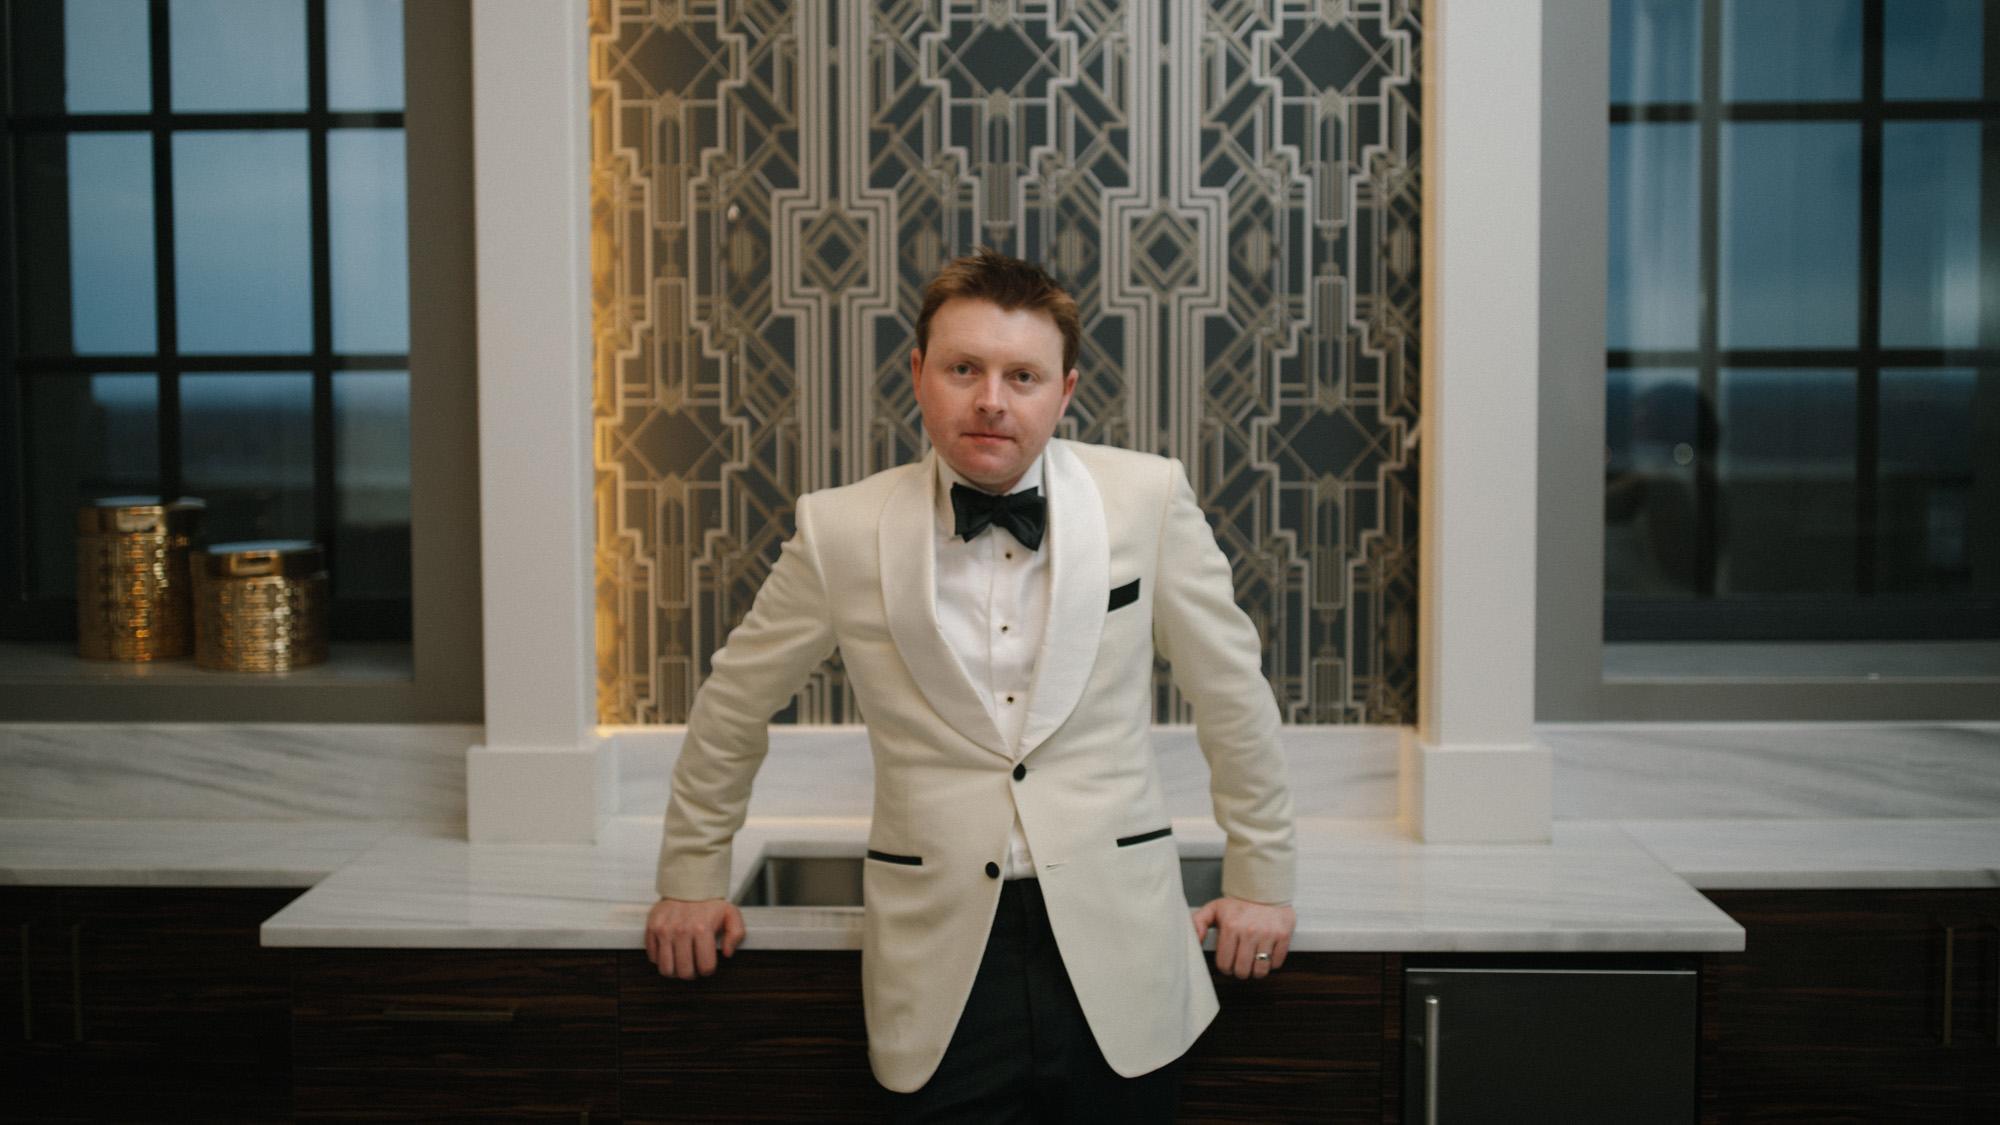 Alec_Vanderboom_kansas_city_hip_wedding_photos-0084.jpg